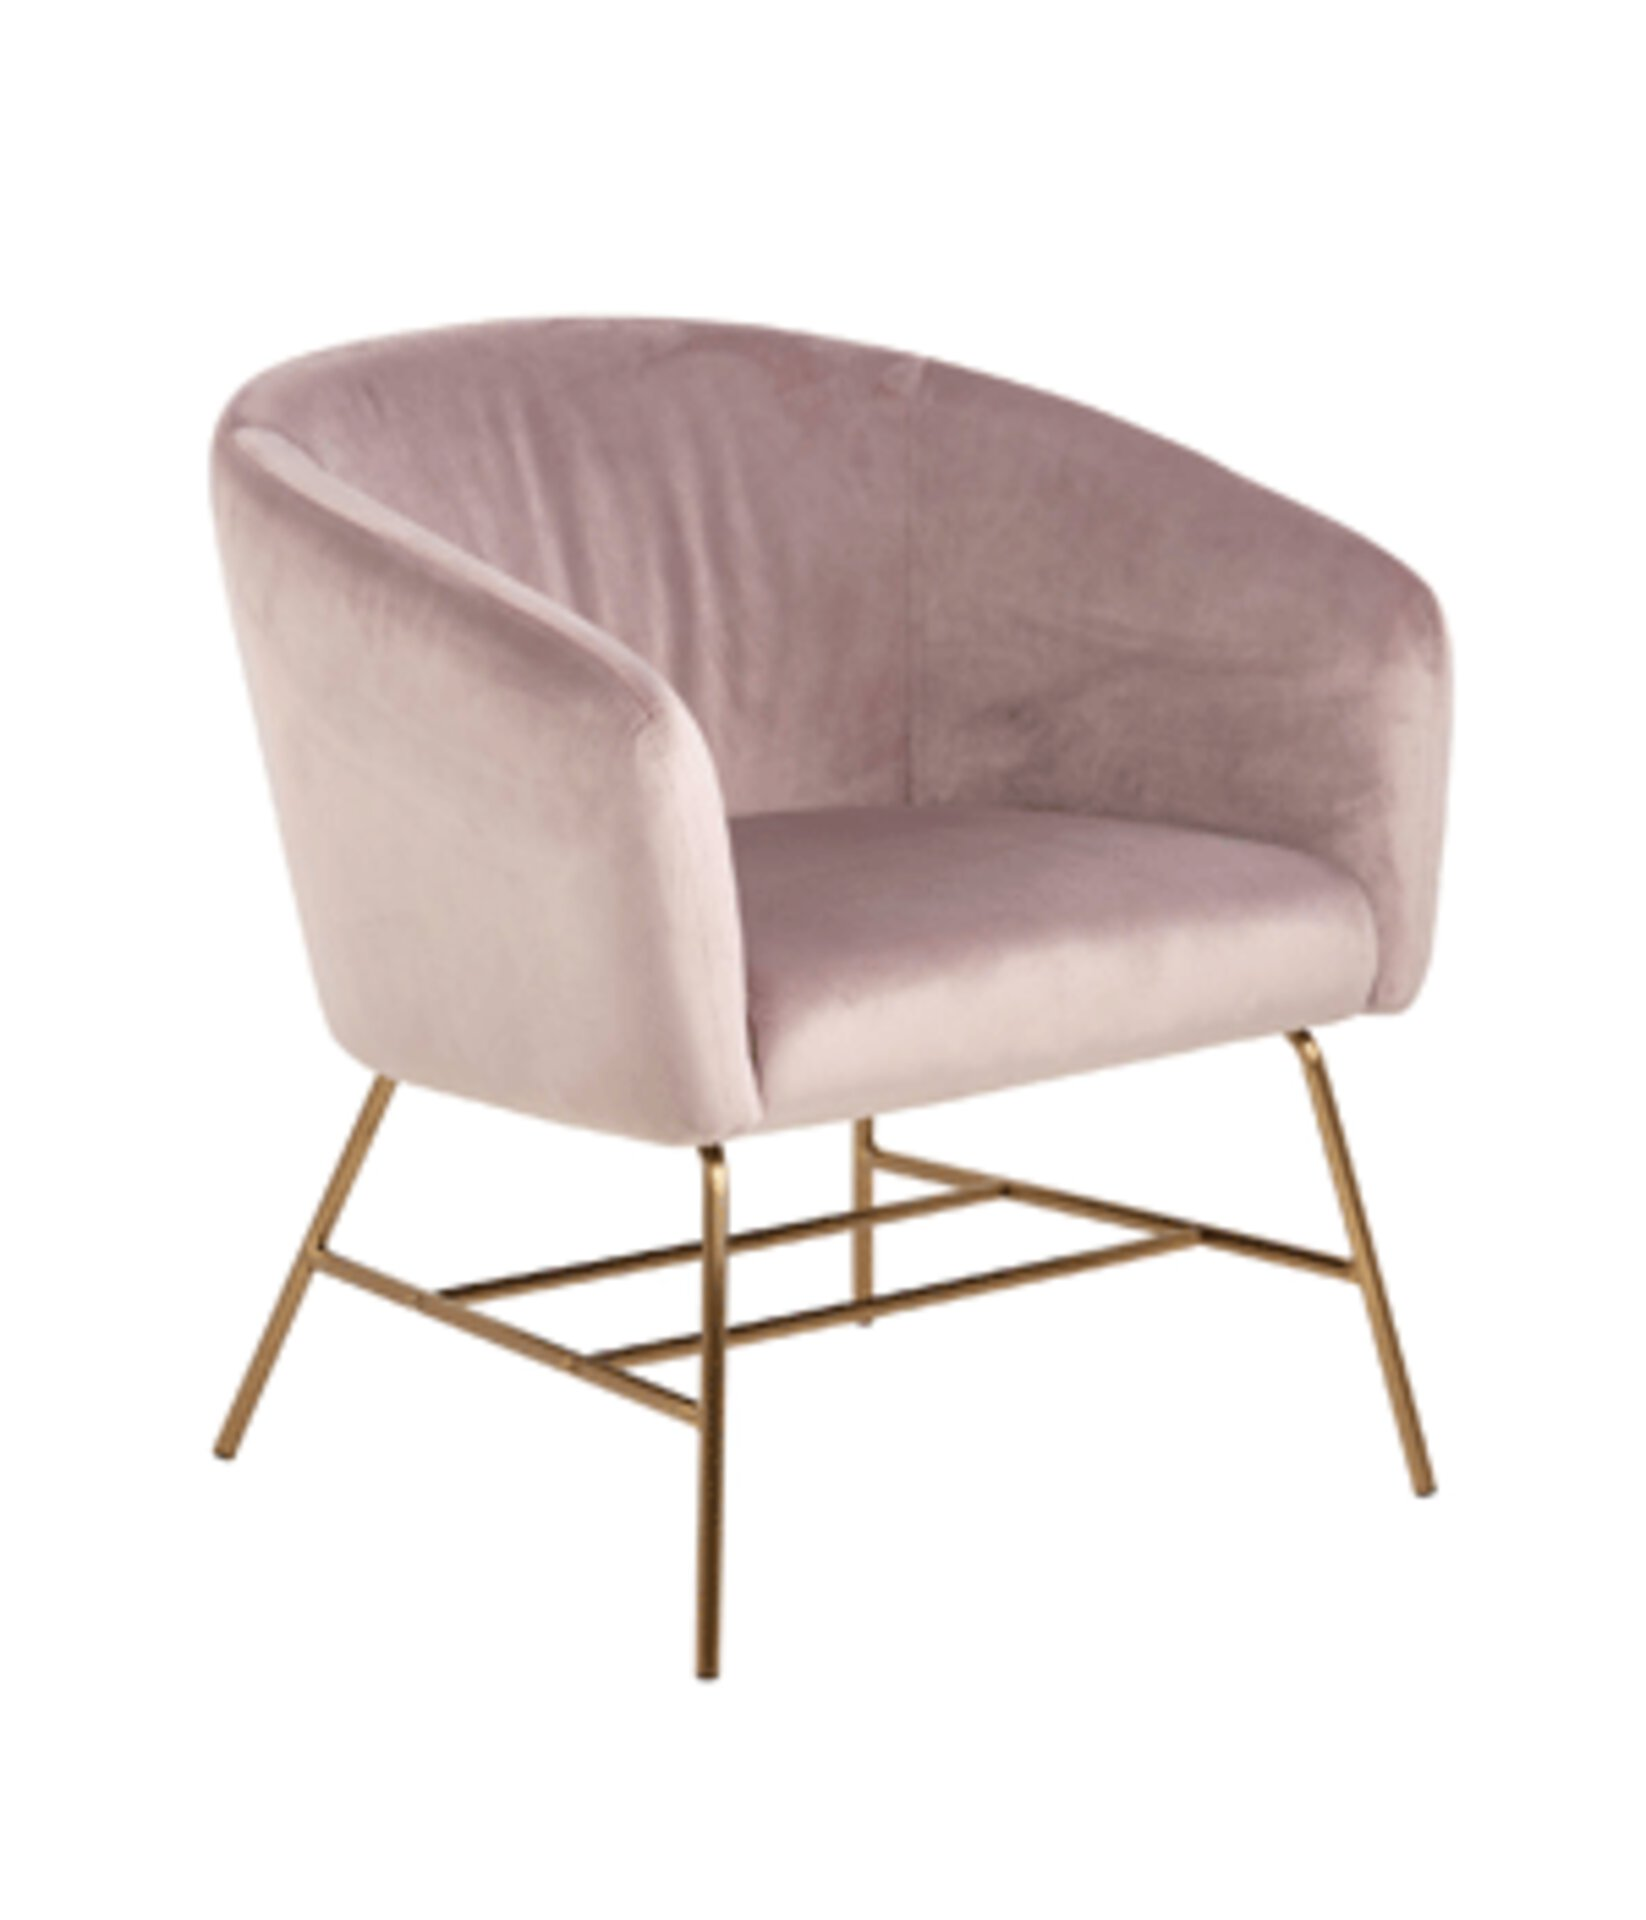 hellrosa Sessel mit goldenen Beinen